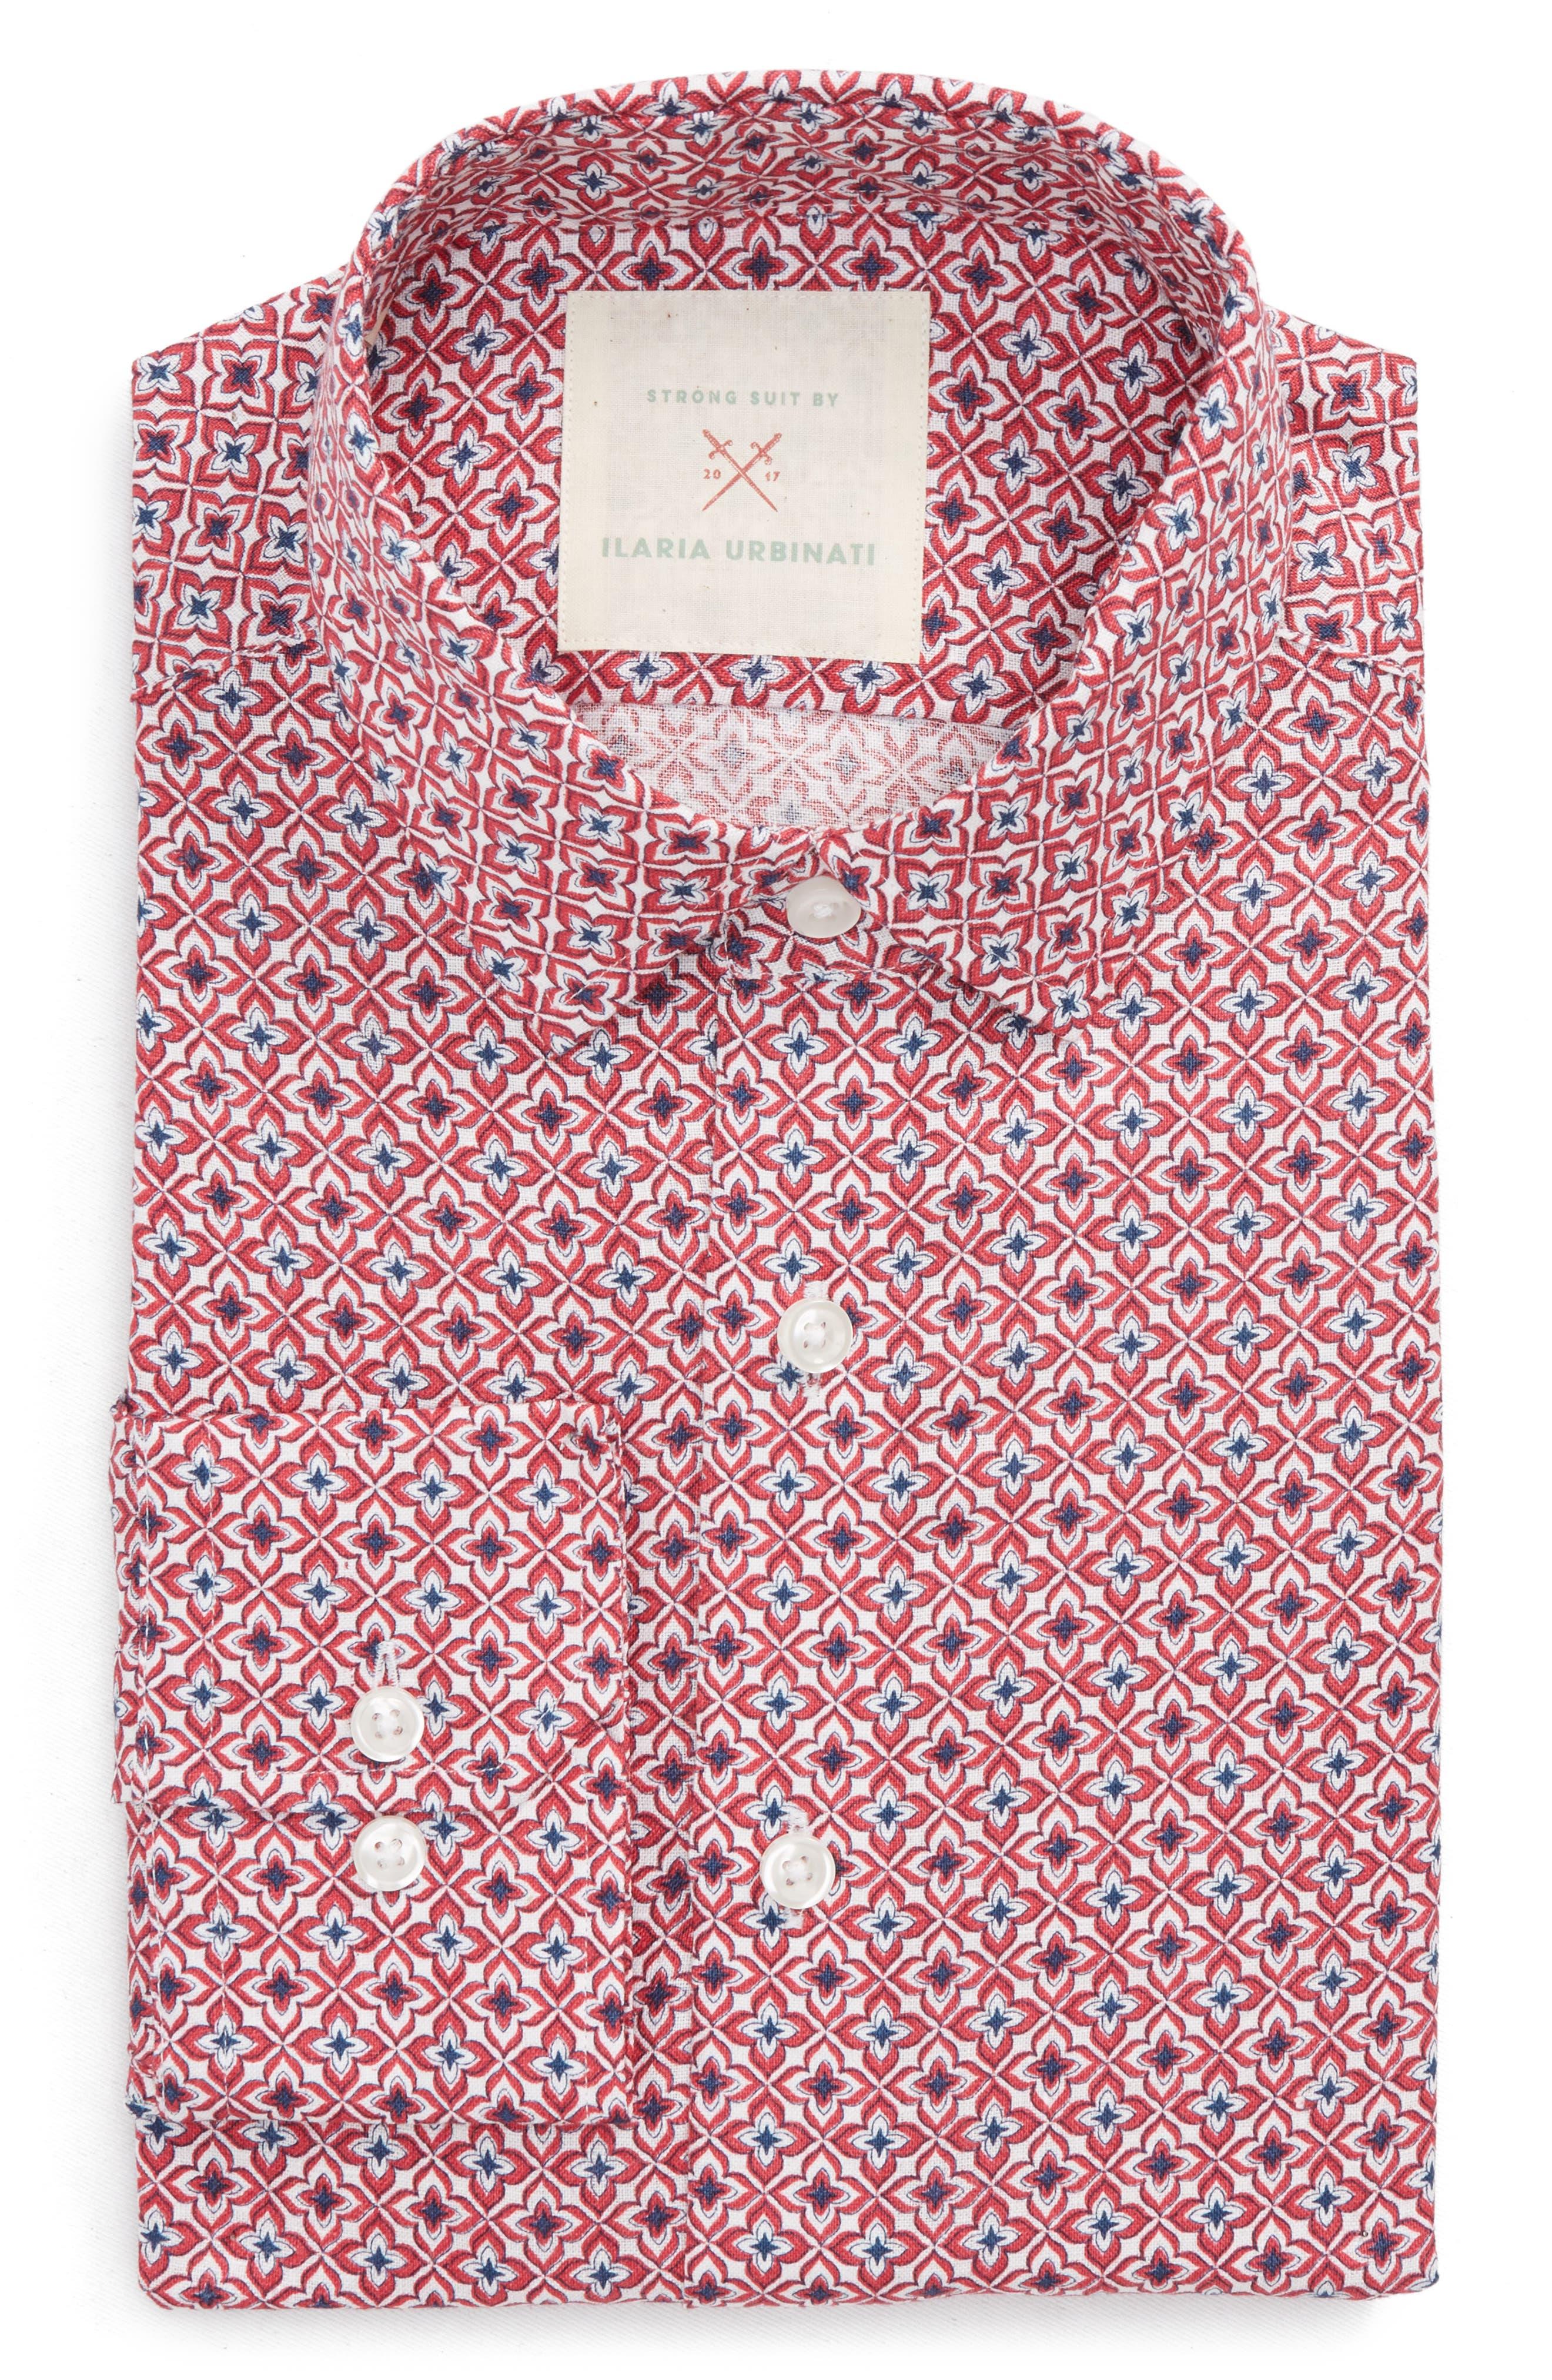 by Ilaria Urbinati Edmond Slim Fit Medallion Dress Shirt,                             Main thumbnail 1, color,